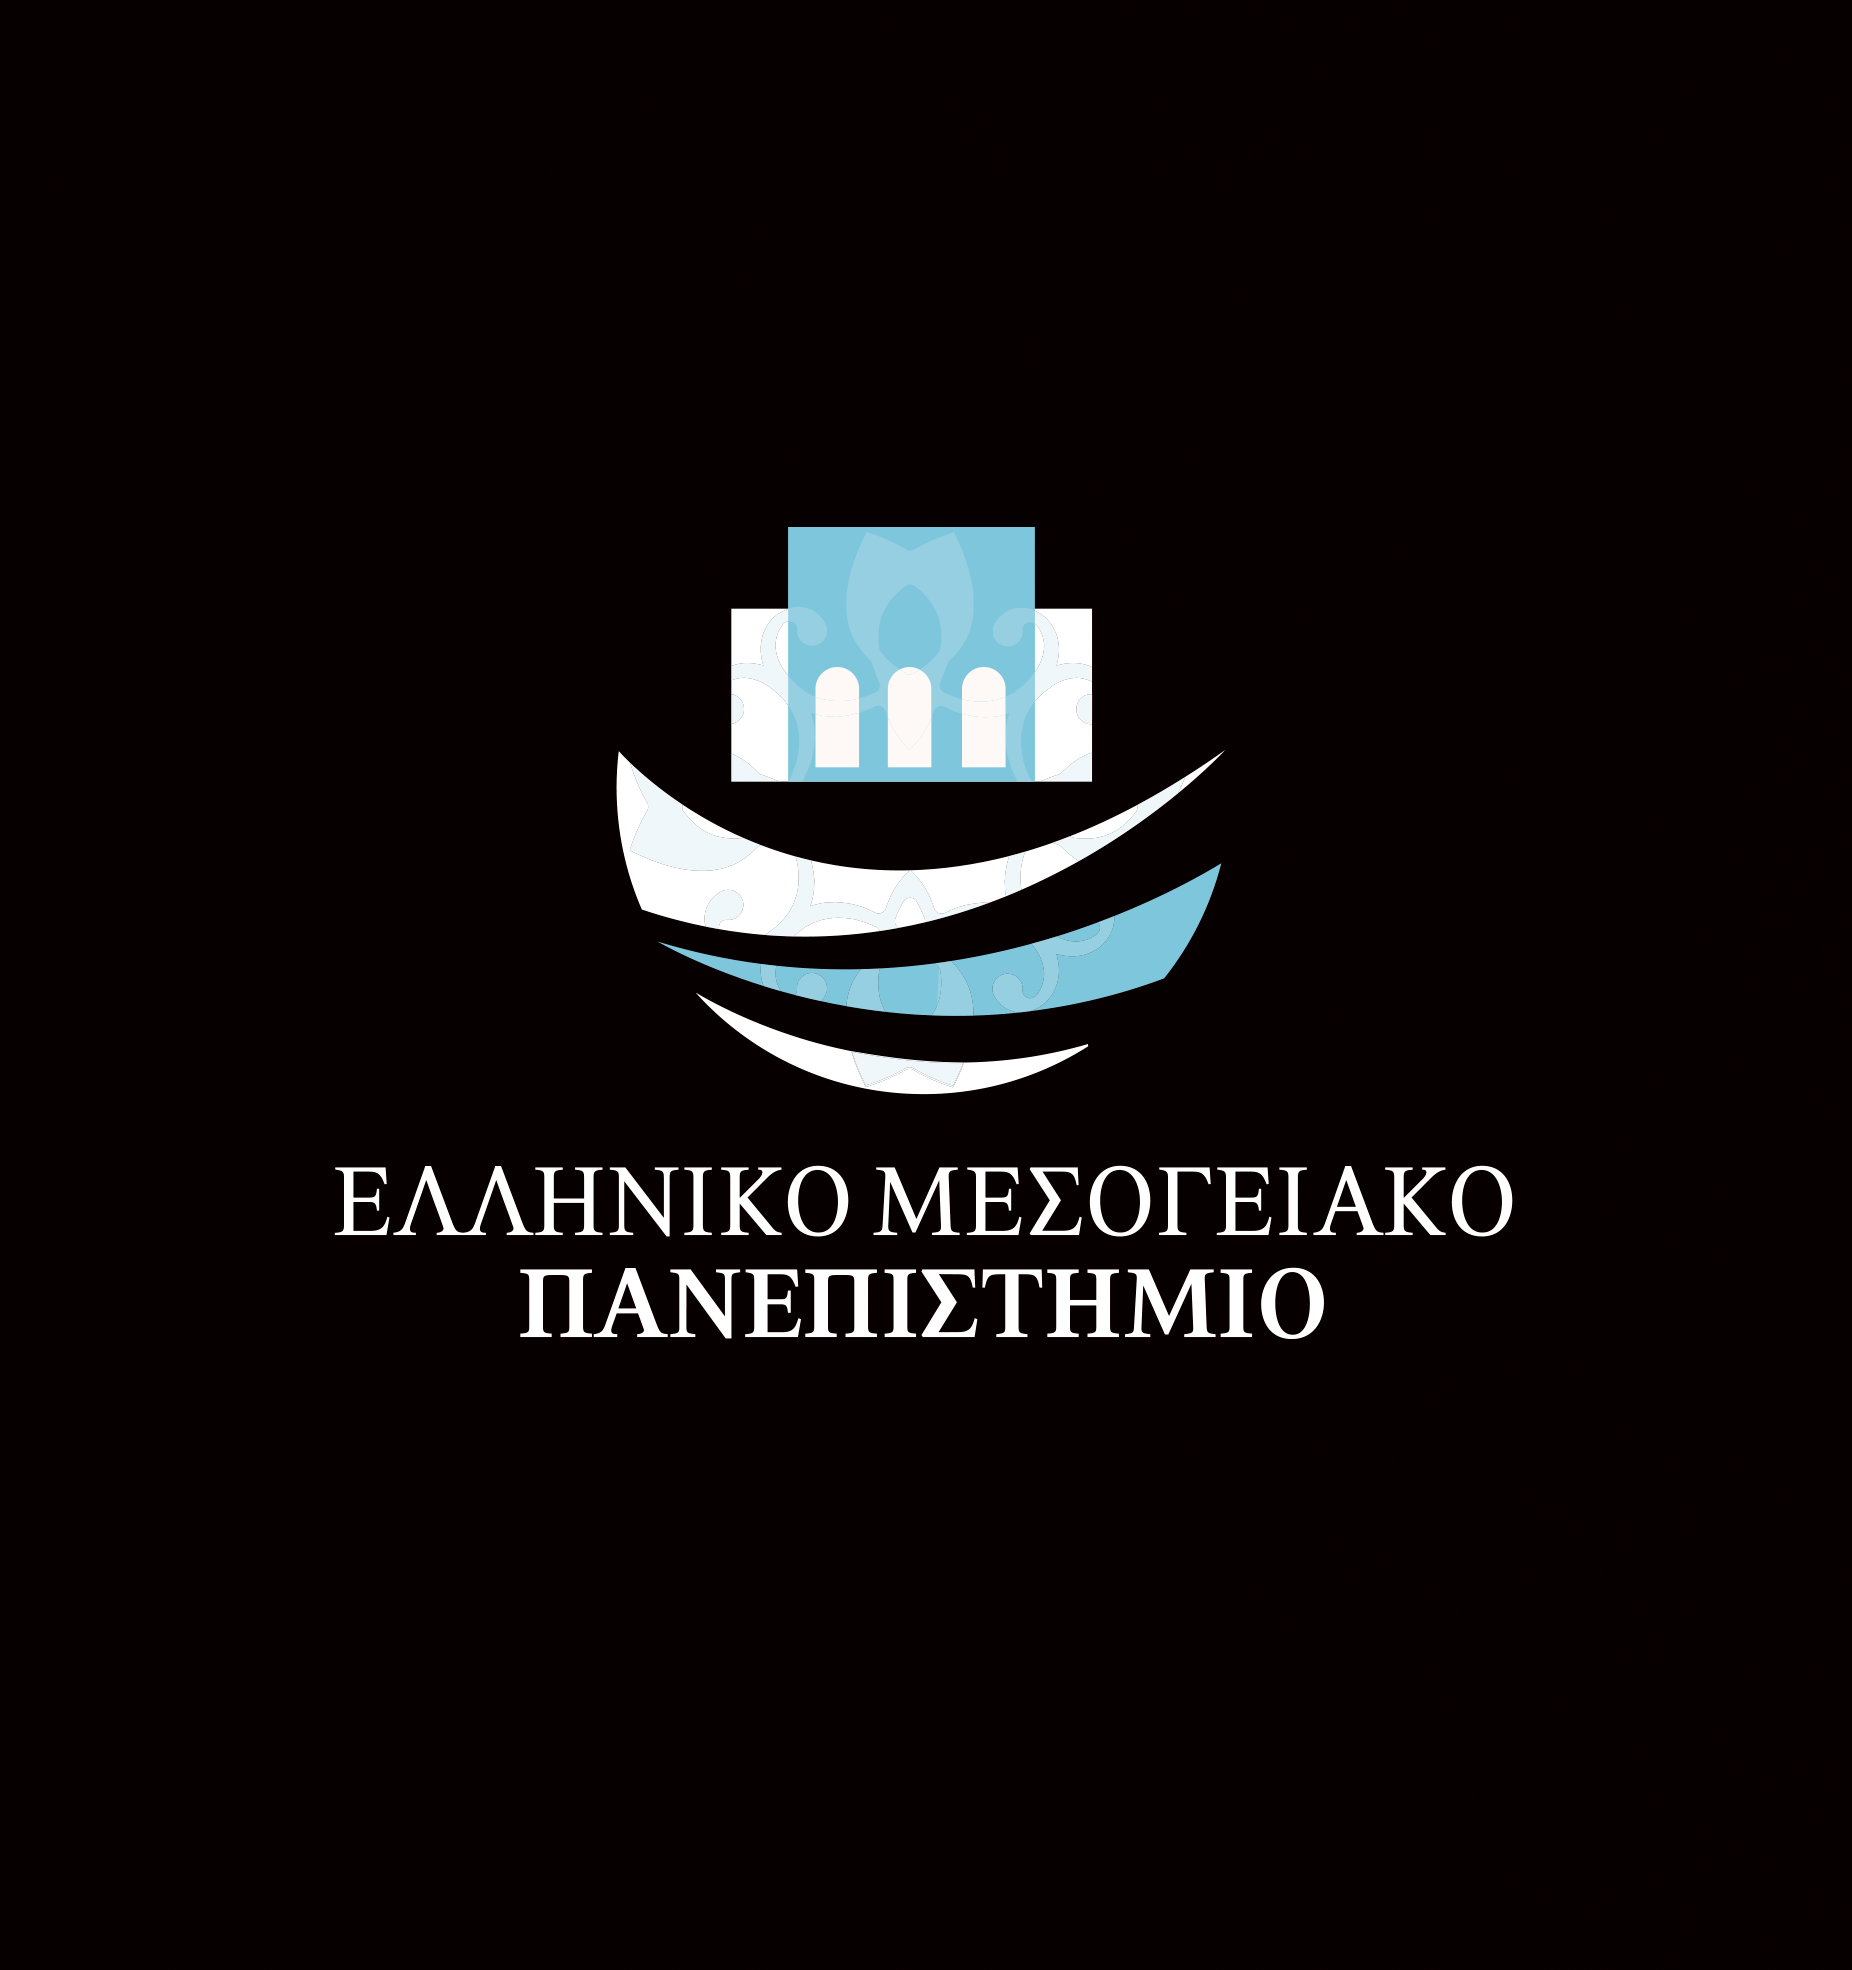 ELMEPA logo on black background